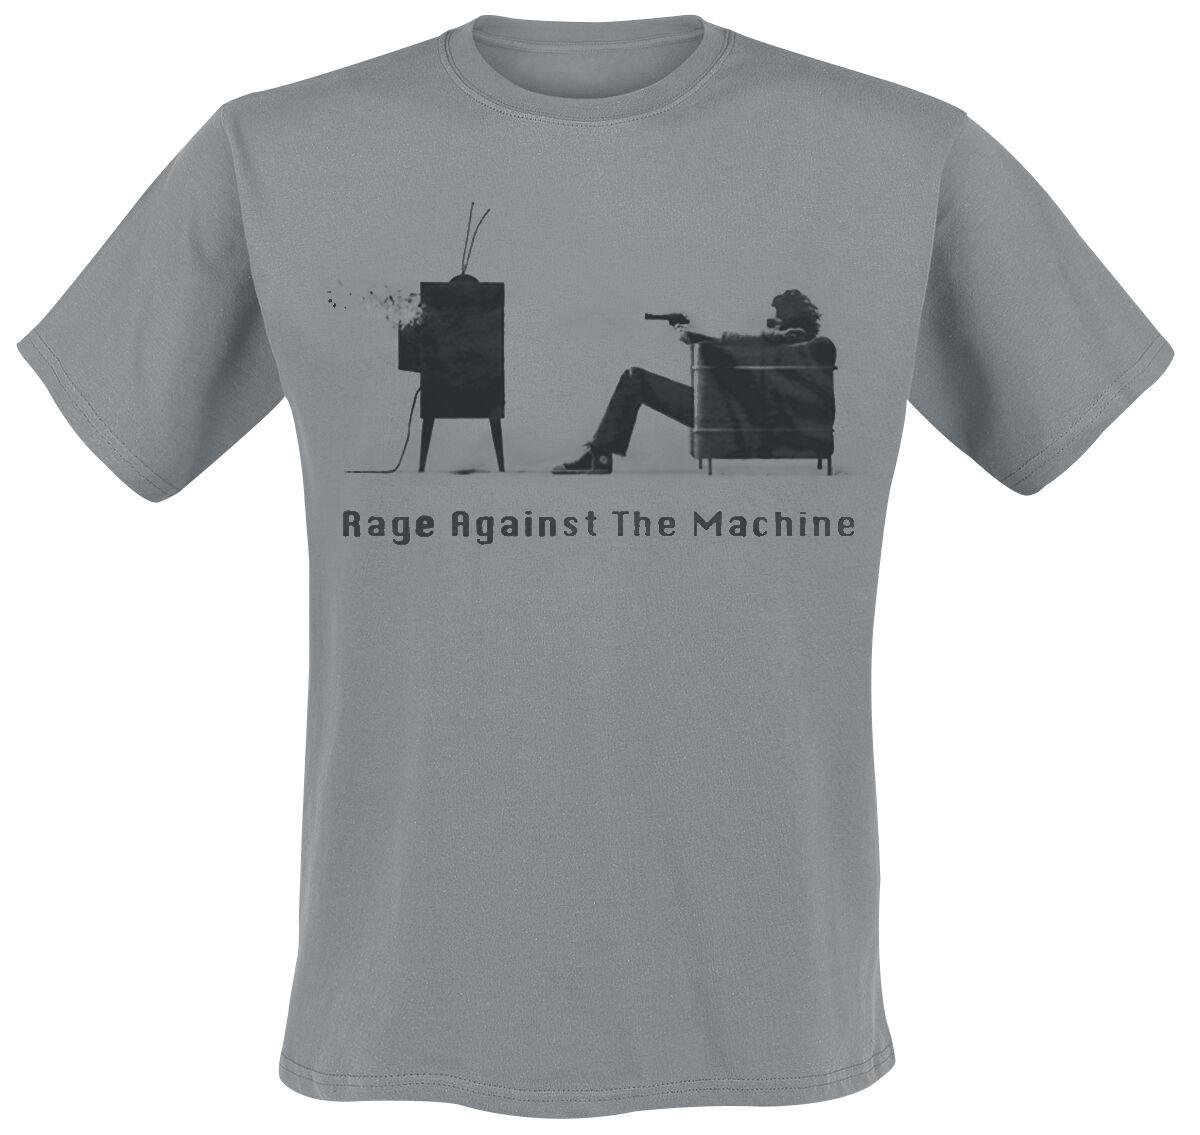 Zespoły - Koszulki - T-Shirt Rage Against The Machine Fuck You Won't Do What You Tell Me T-Shirt szary - 174620